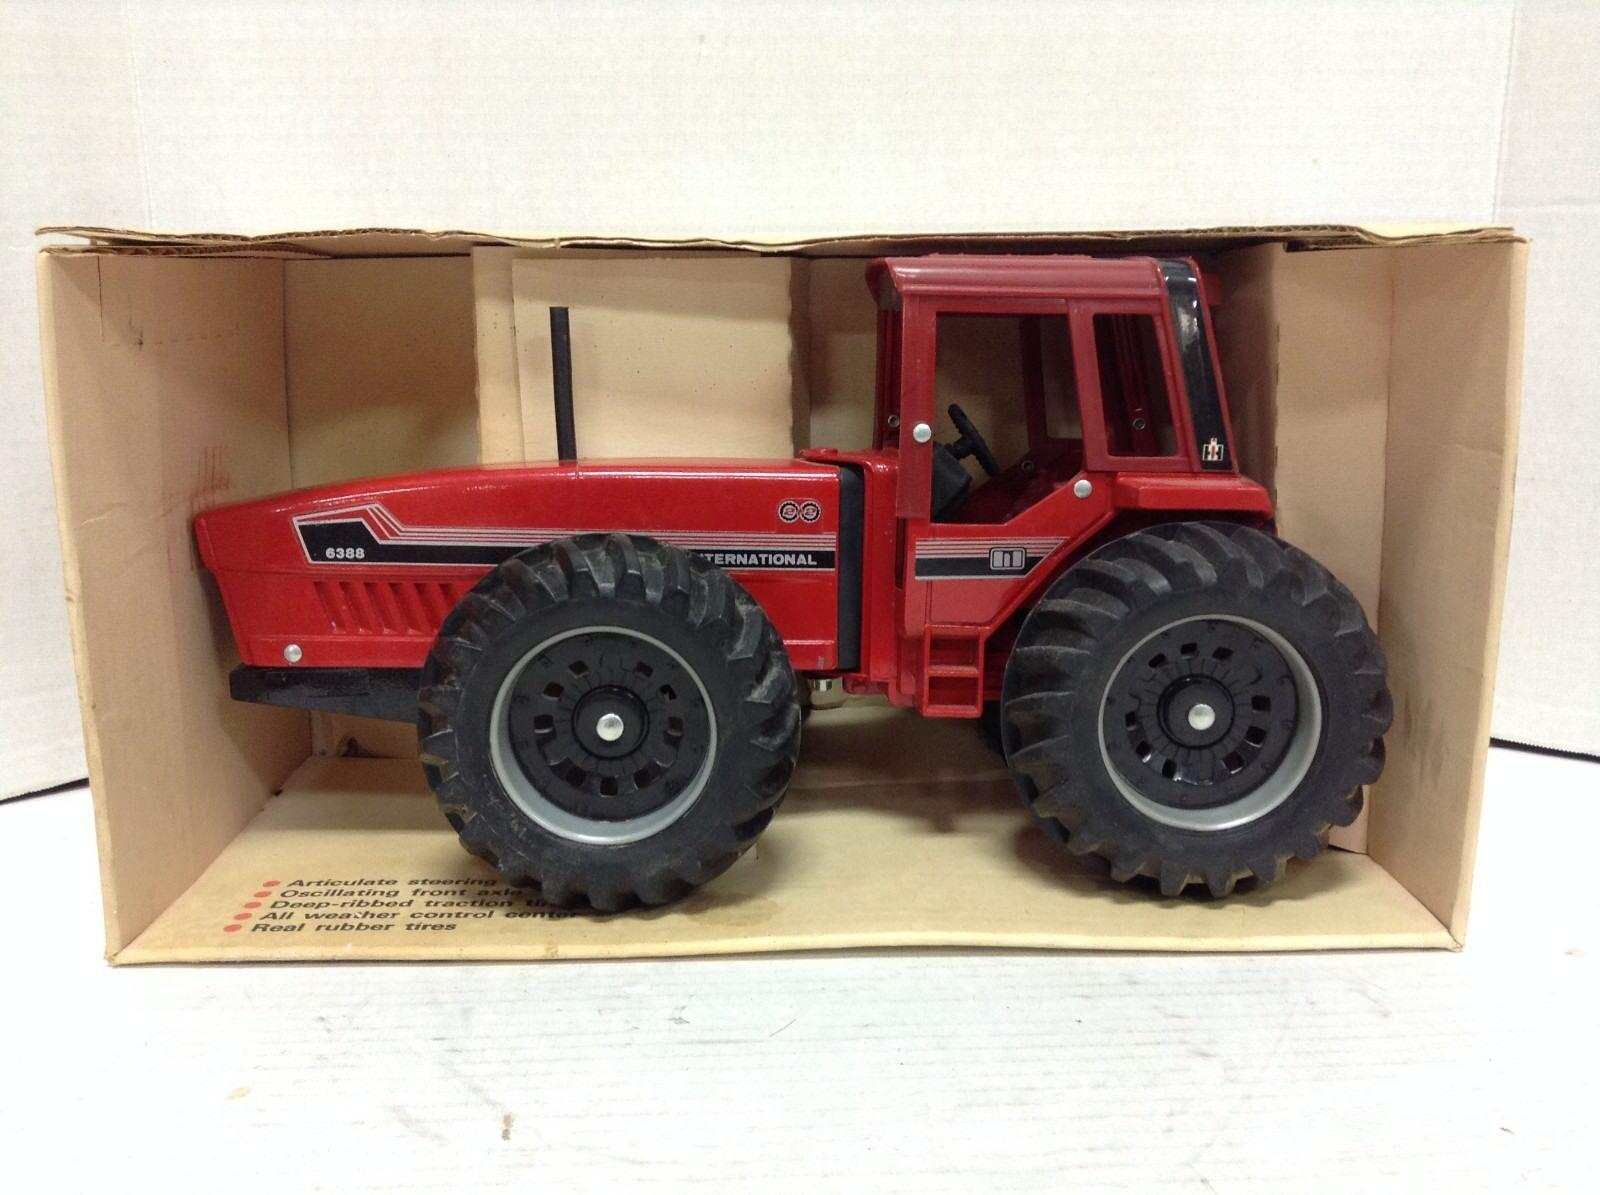 ERTL IH 6388 CASE INTERNATIONAL Diecast 2+2 jouet  tracteur échelle 1 16  464-8241  magasin d'usine